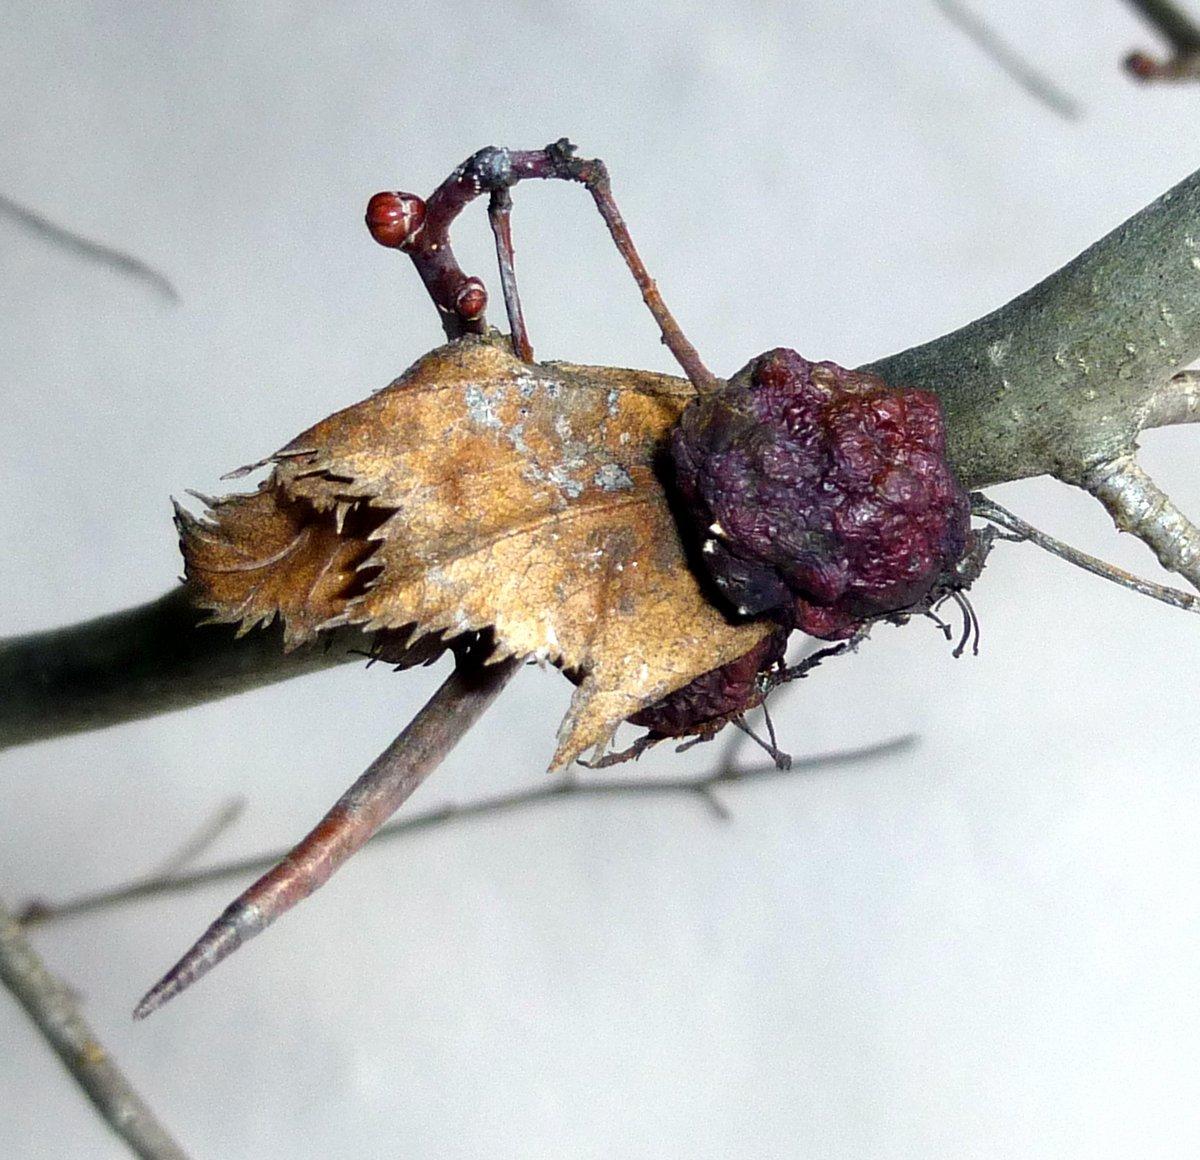 7. Hawthorn Fruit